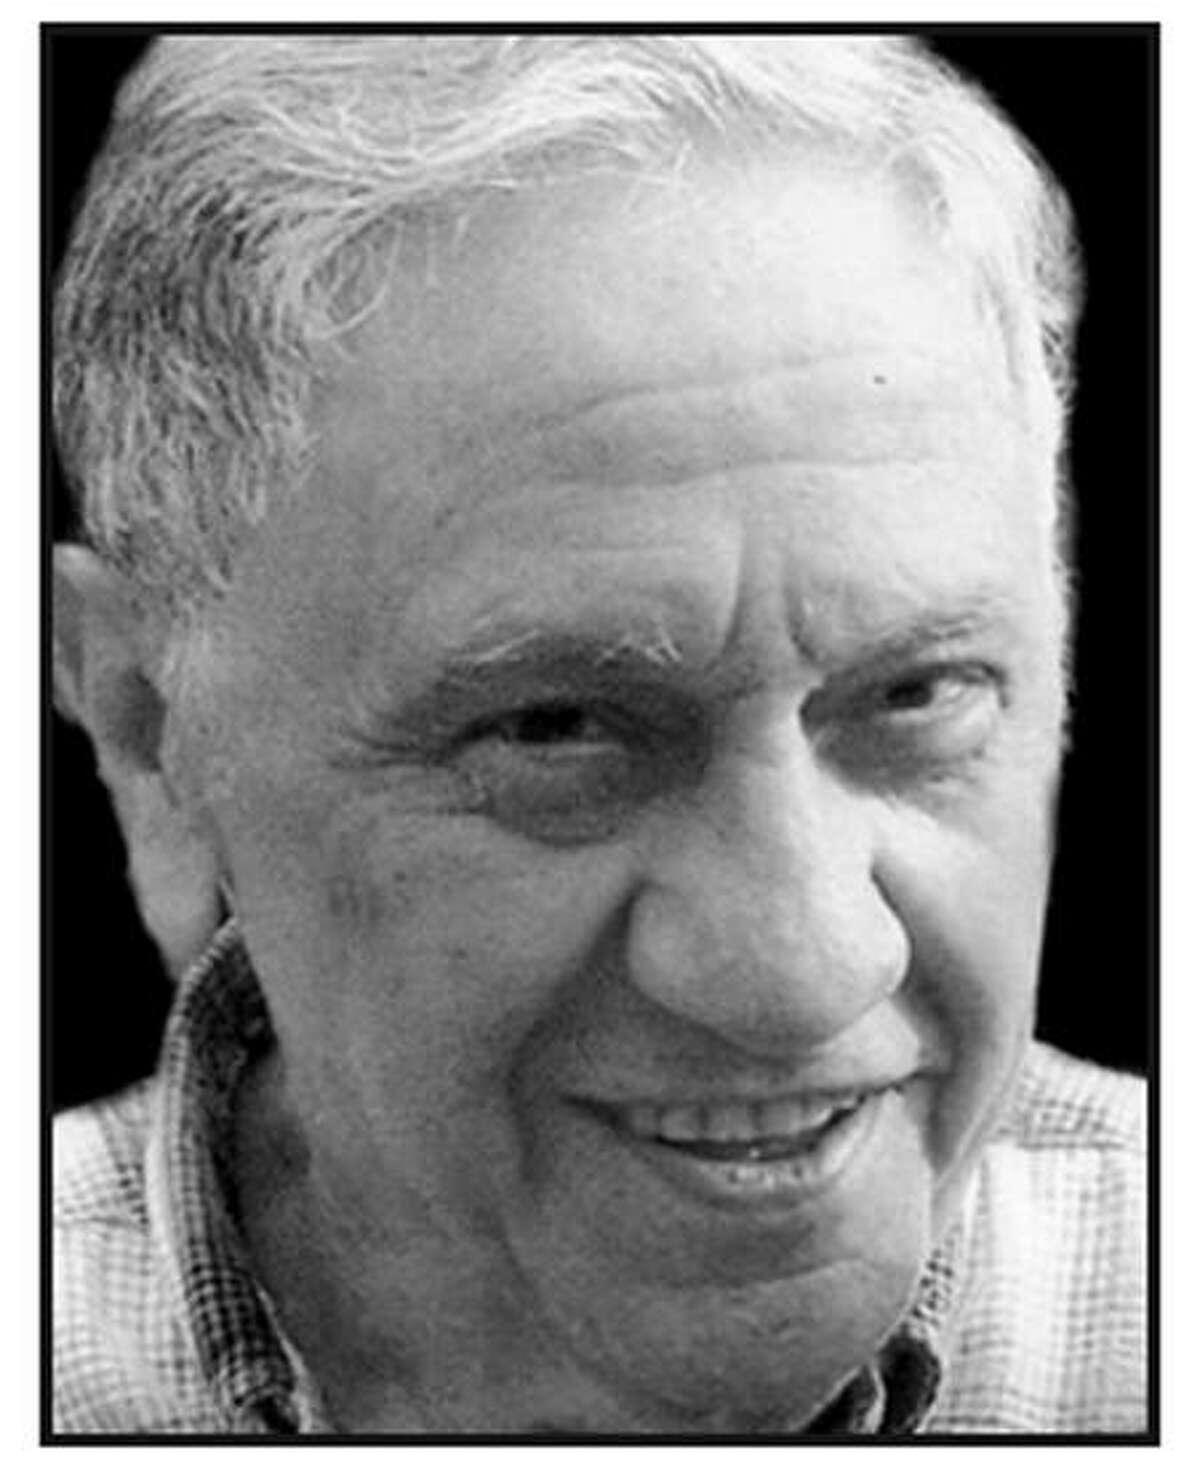 Frank DiPiazza